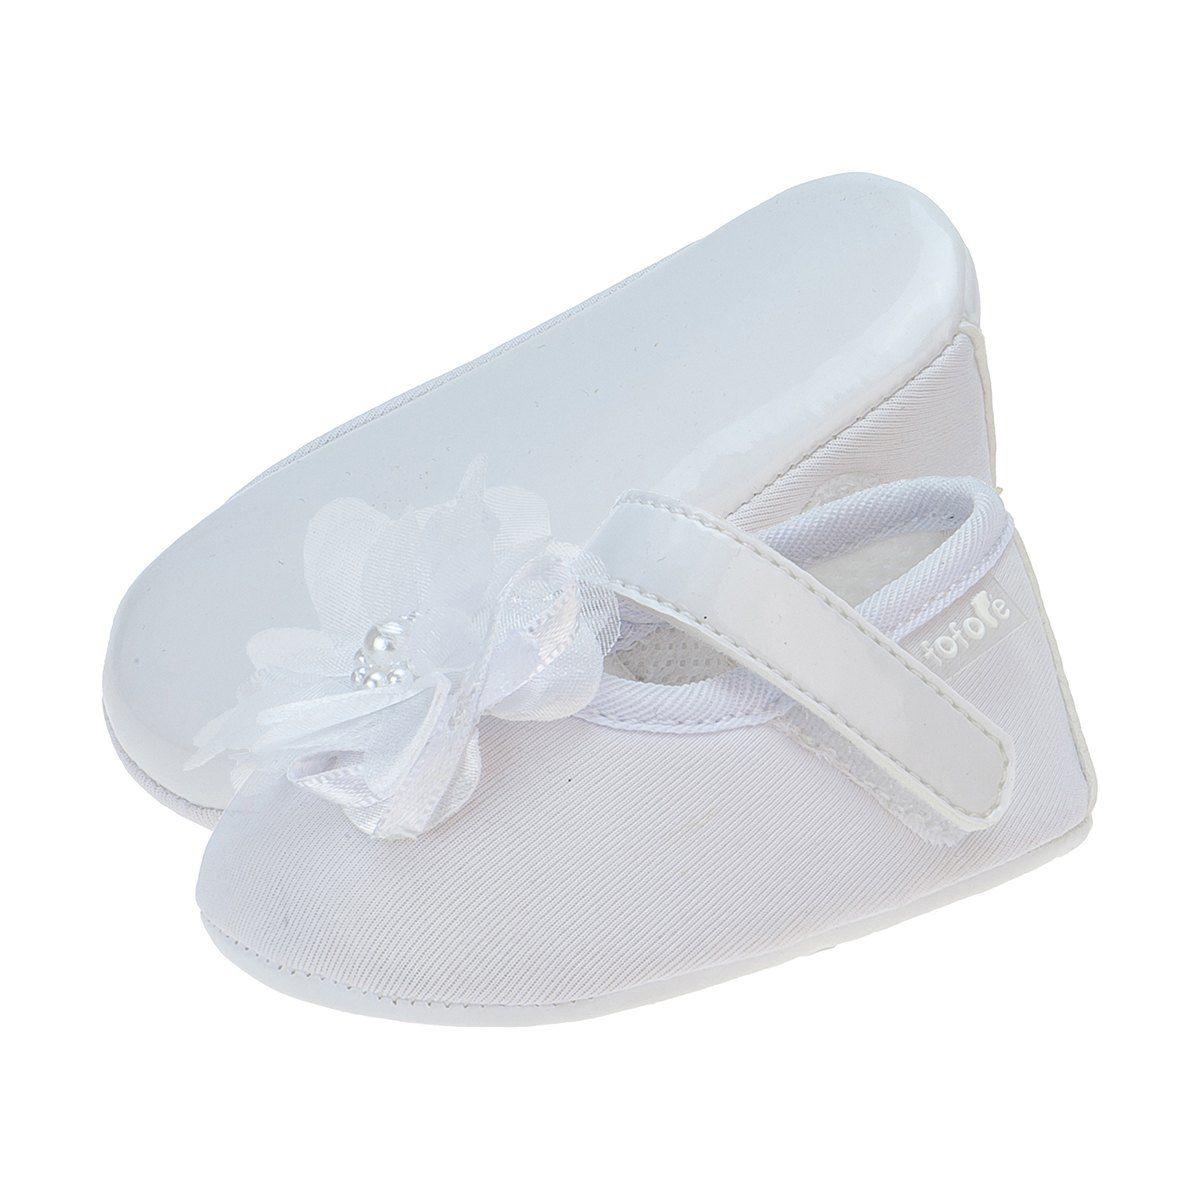 Sapato Boneca Flor Menina Branca - FOFOPÉ